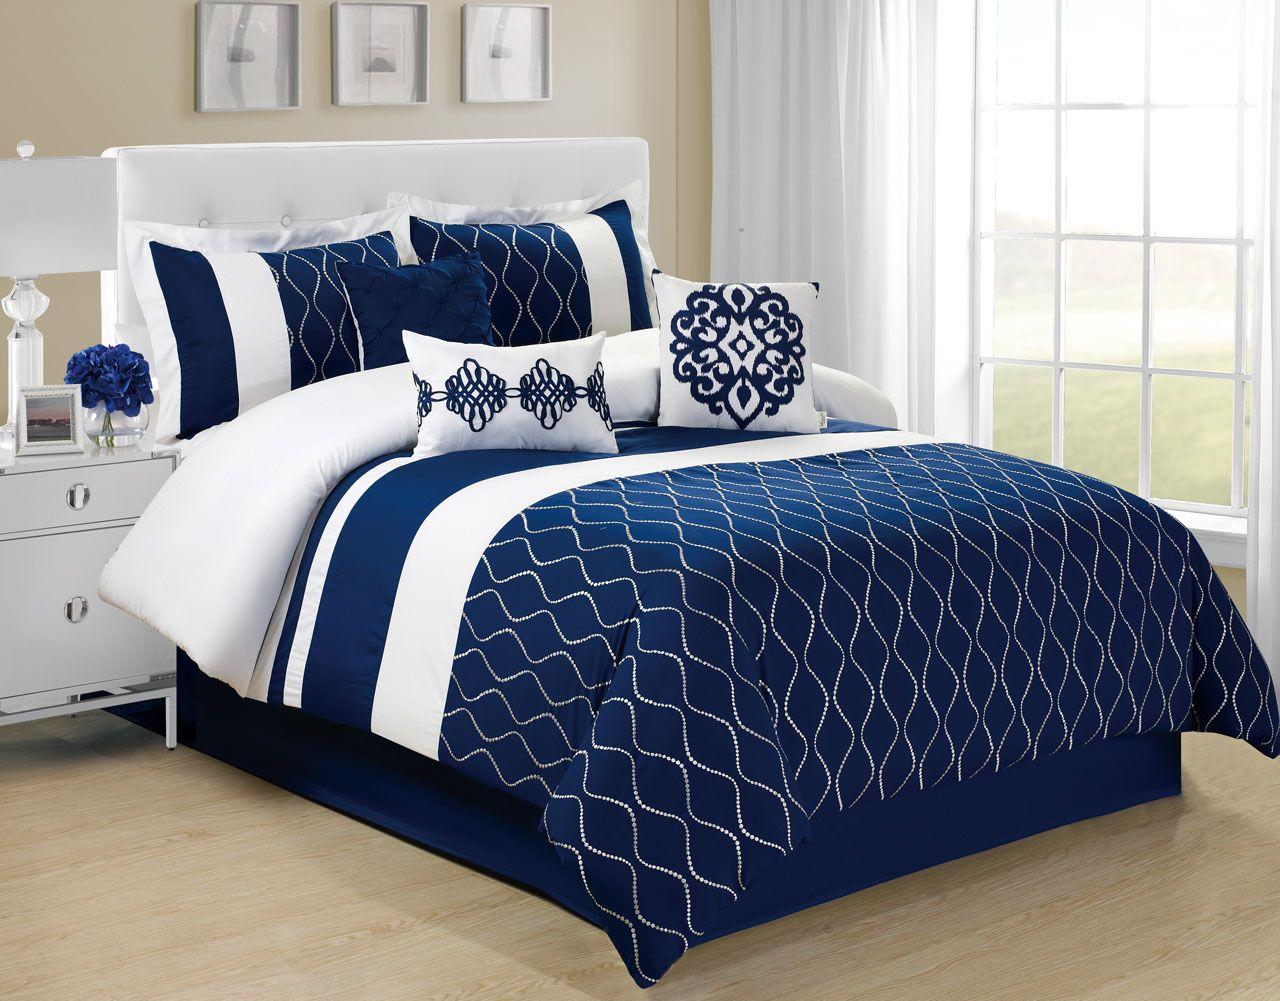 7 Piece Malibu Navy White Comforter Set Comforter Sets Blue